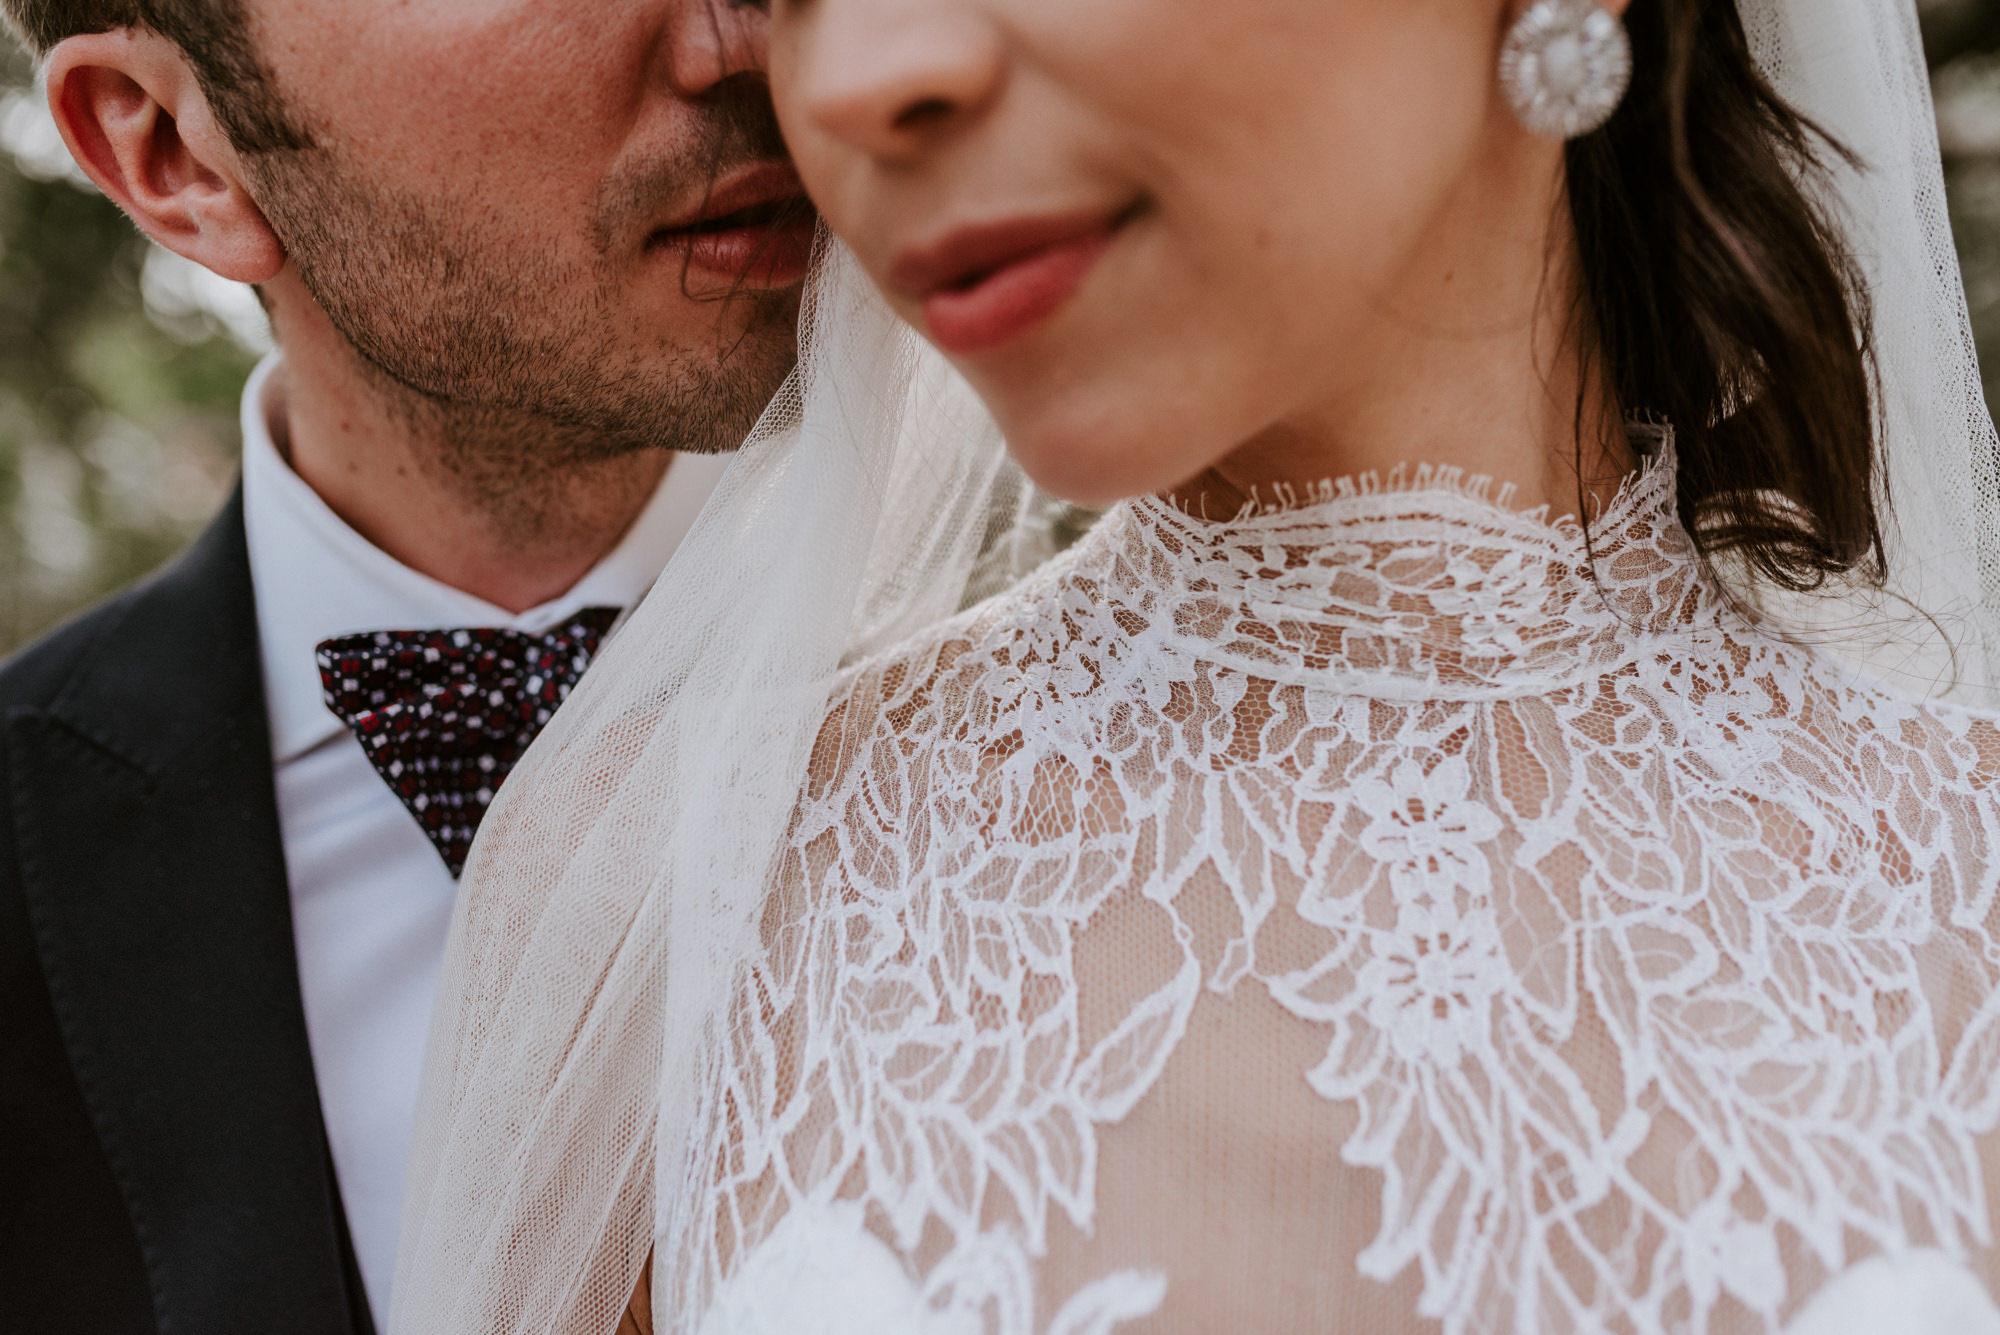 FOTO+PHOTO+BODA+WEDDING+ITALIA+ITALY+MAURICIO+GARAY+MAURICIOGARAY+WEDDINPHOTOGRAPHER+FOTOGRAFODEBODA-1285.jpg